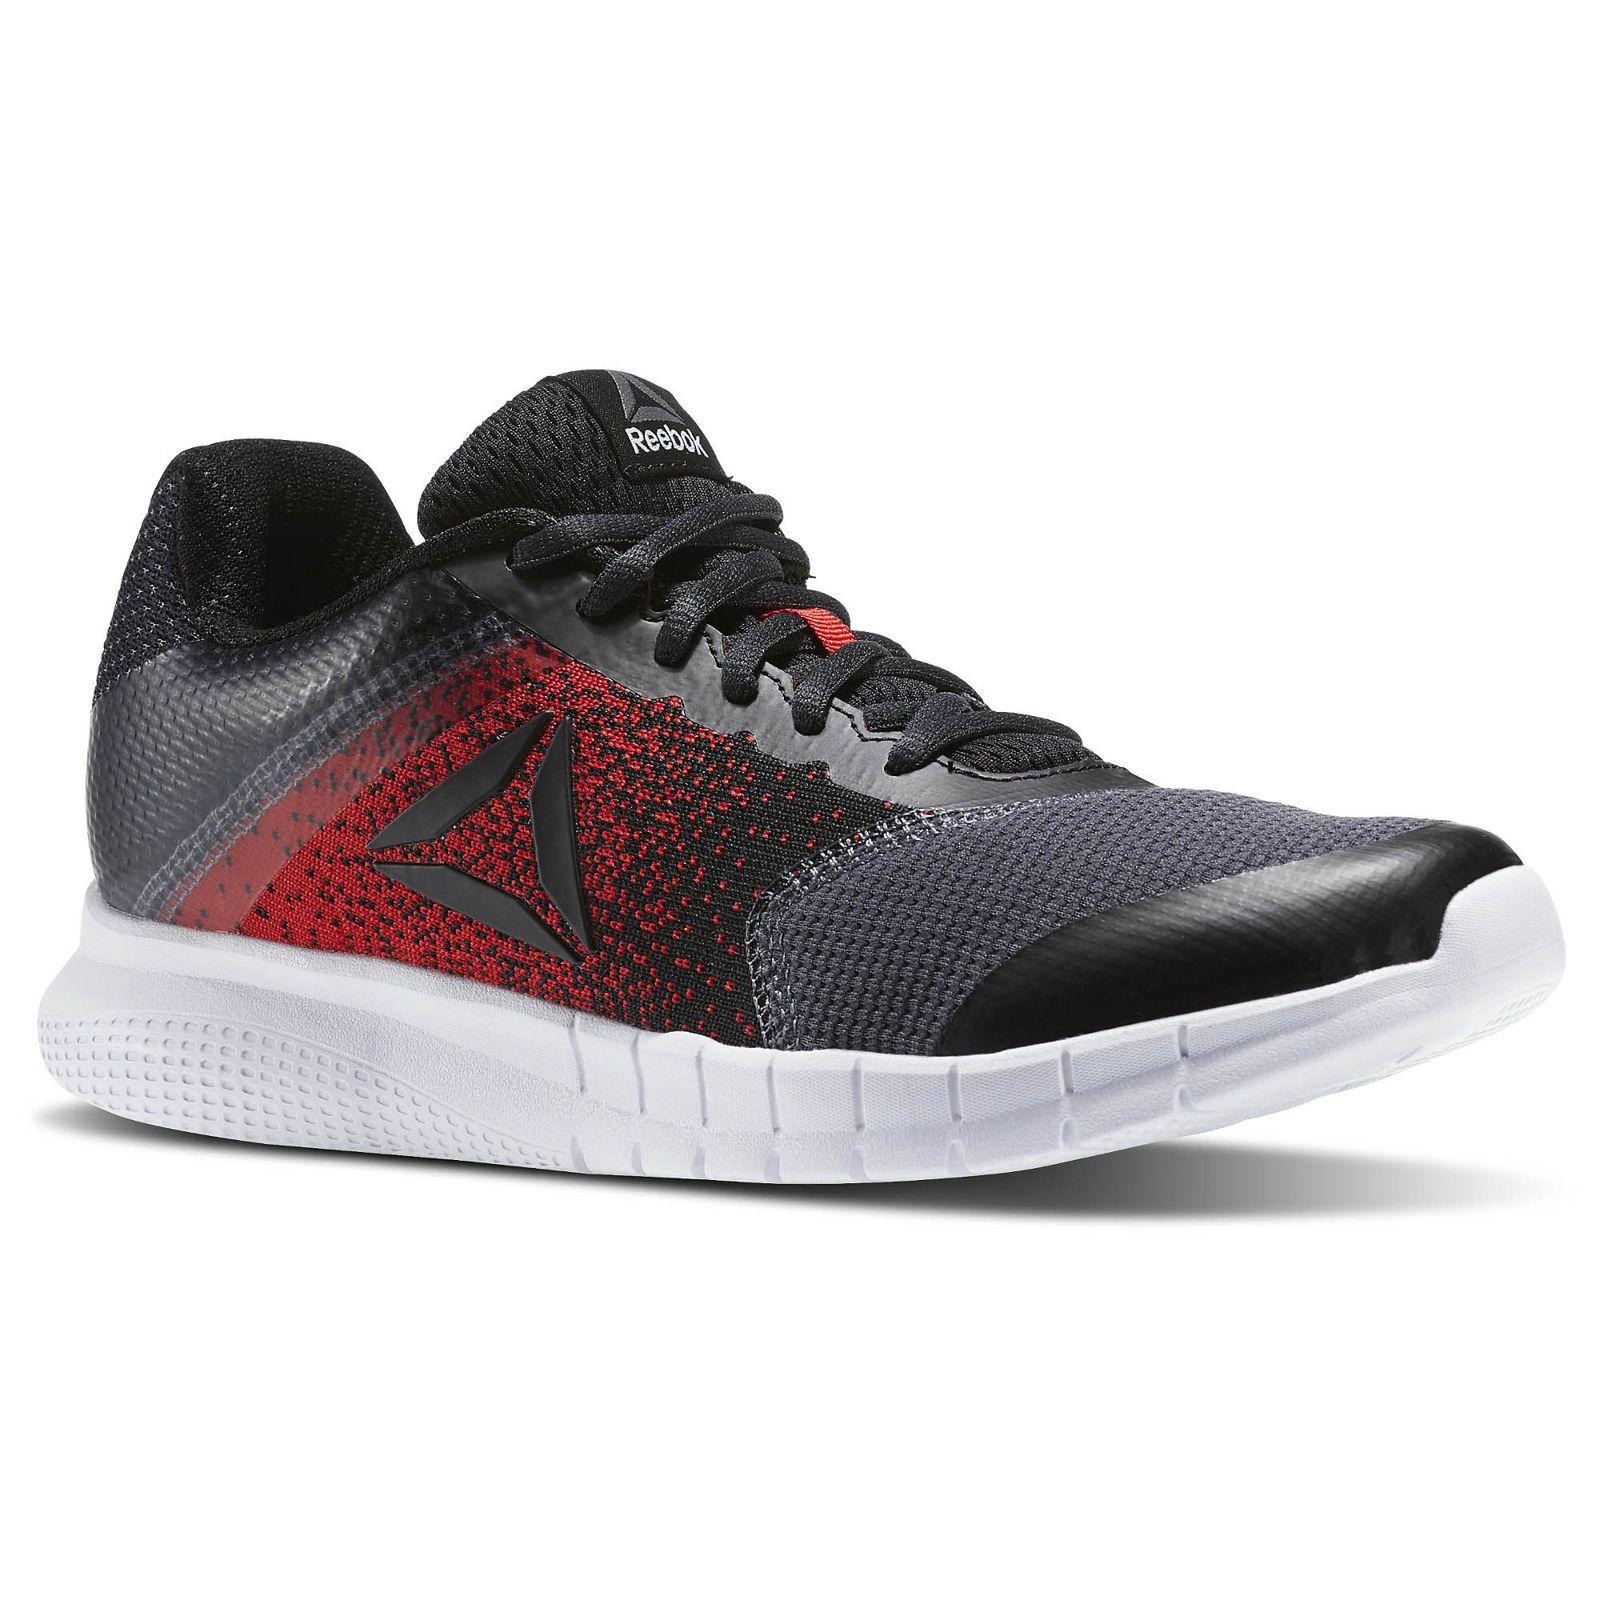 Reebok Mens Instalite Run Shoes